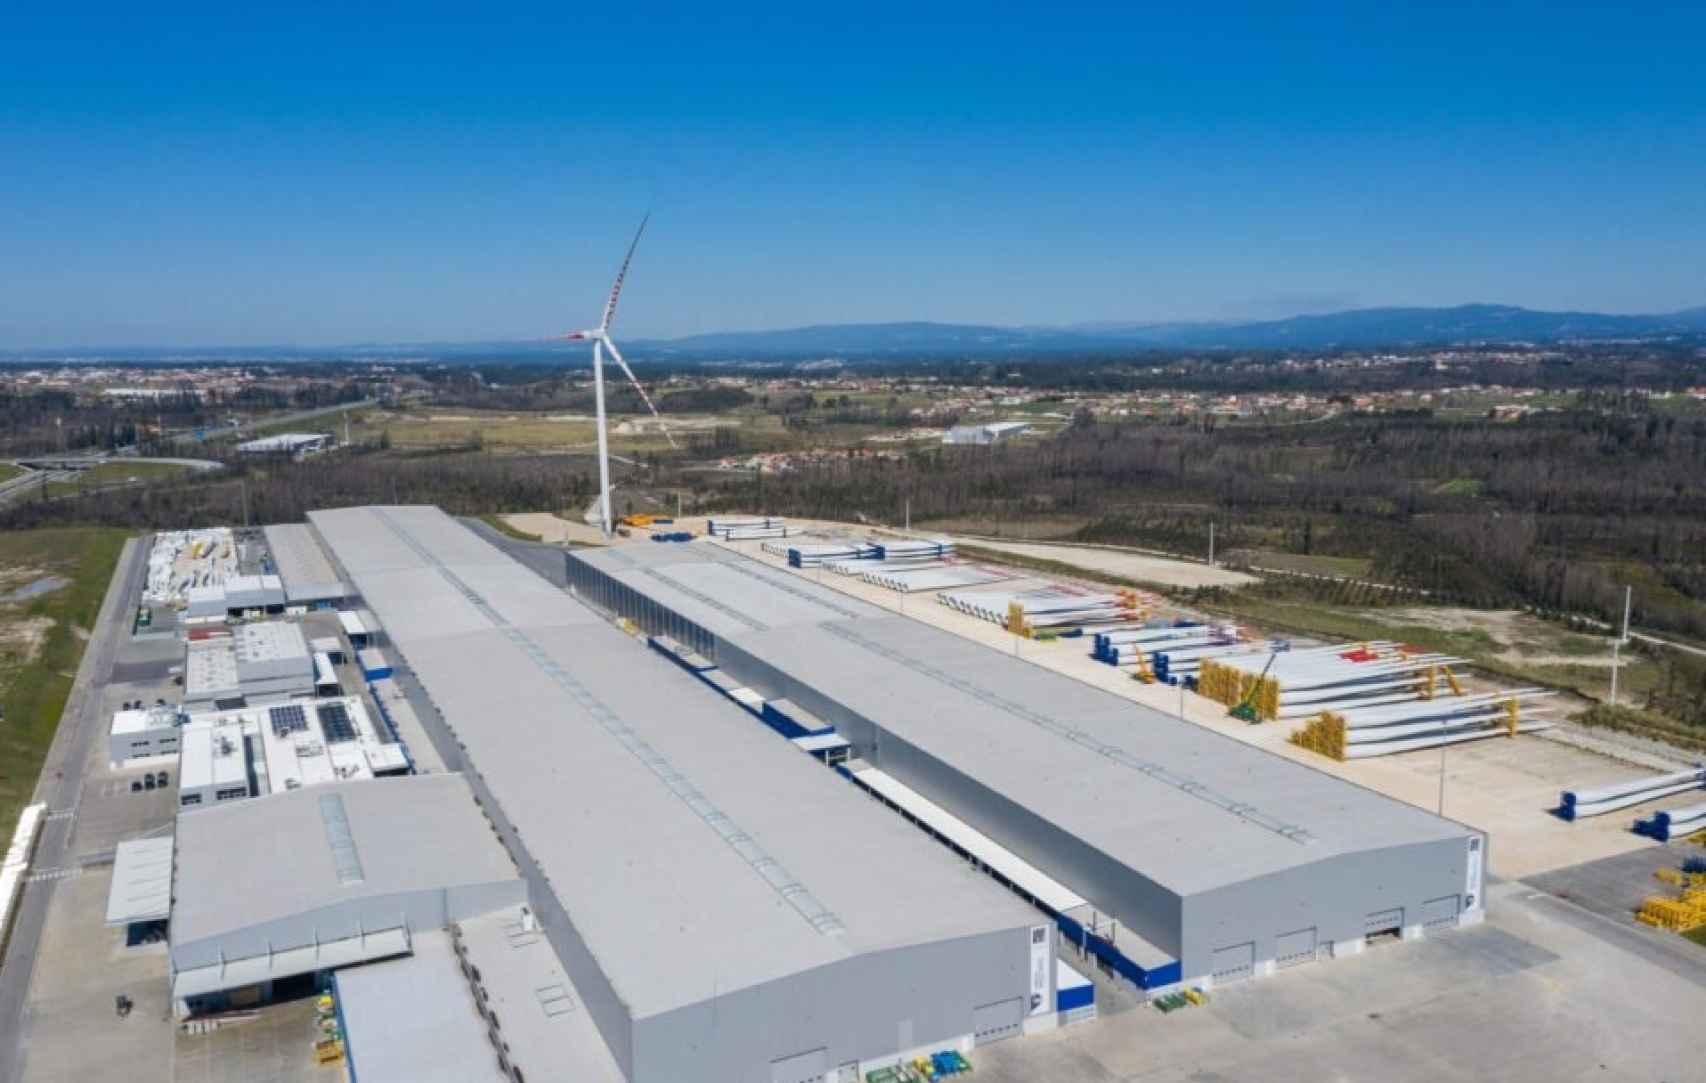 Planta de palas de Senvion en Vagos, Portugal, vendida a Siemens Gamesa